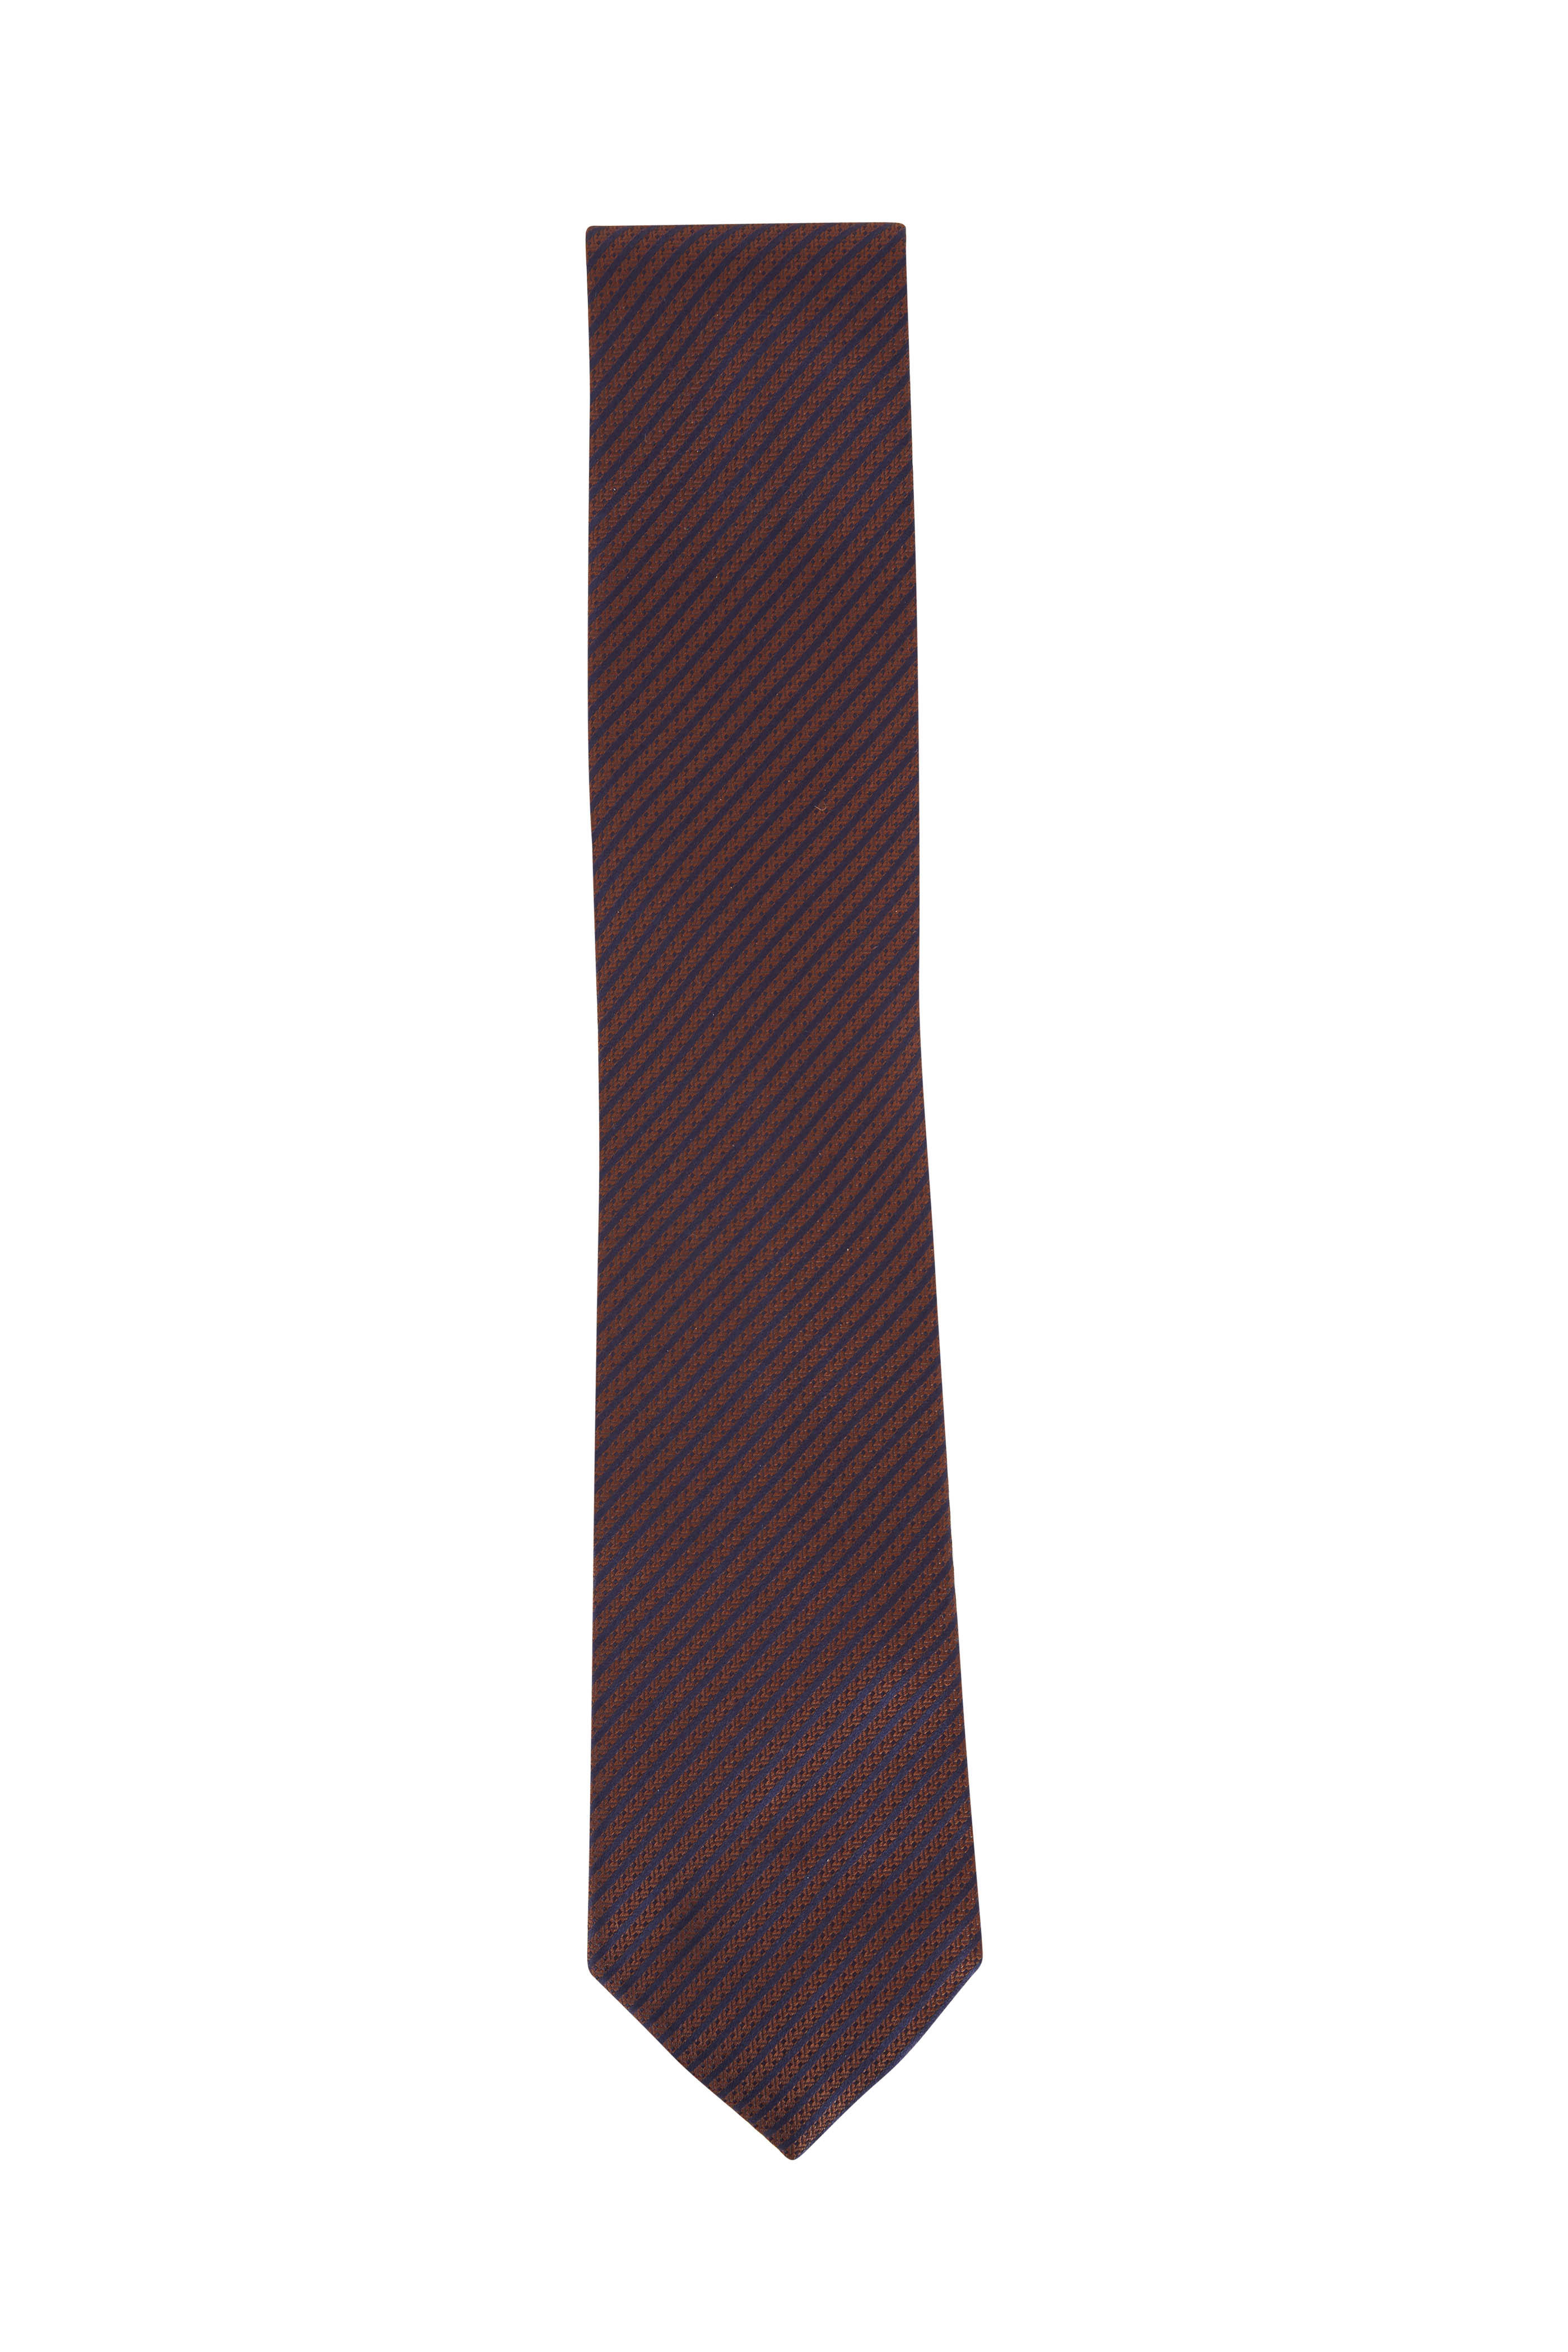 9b8a6a4a Ermenegildo Zegna - Burgundy & Black Stripe Silk Necktie | Mitchell ...